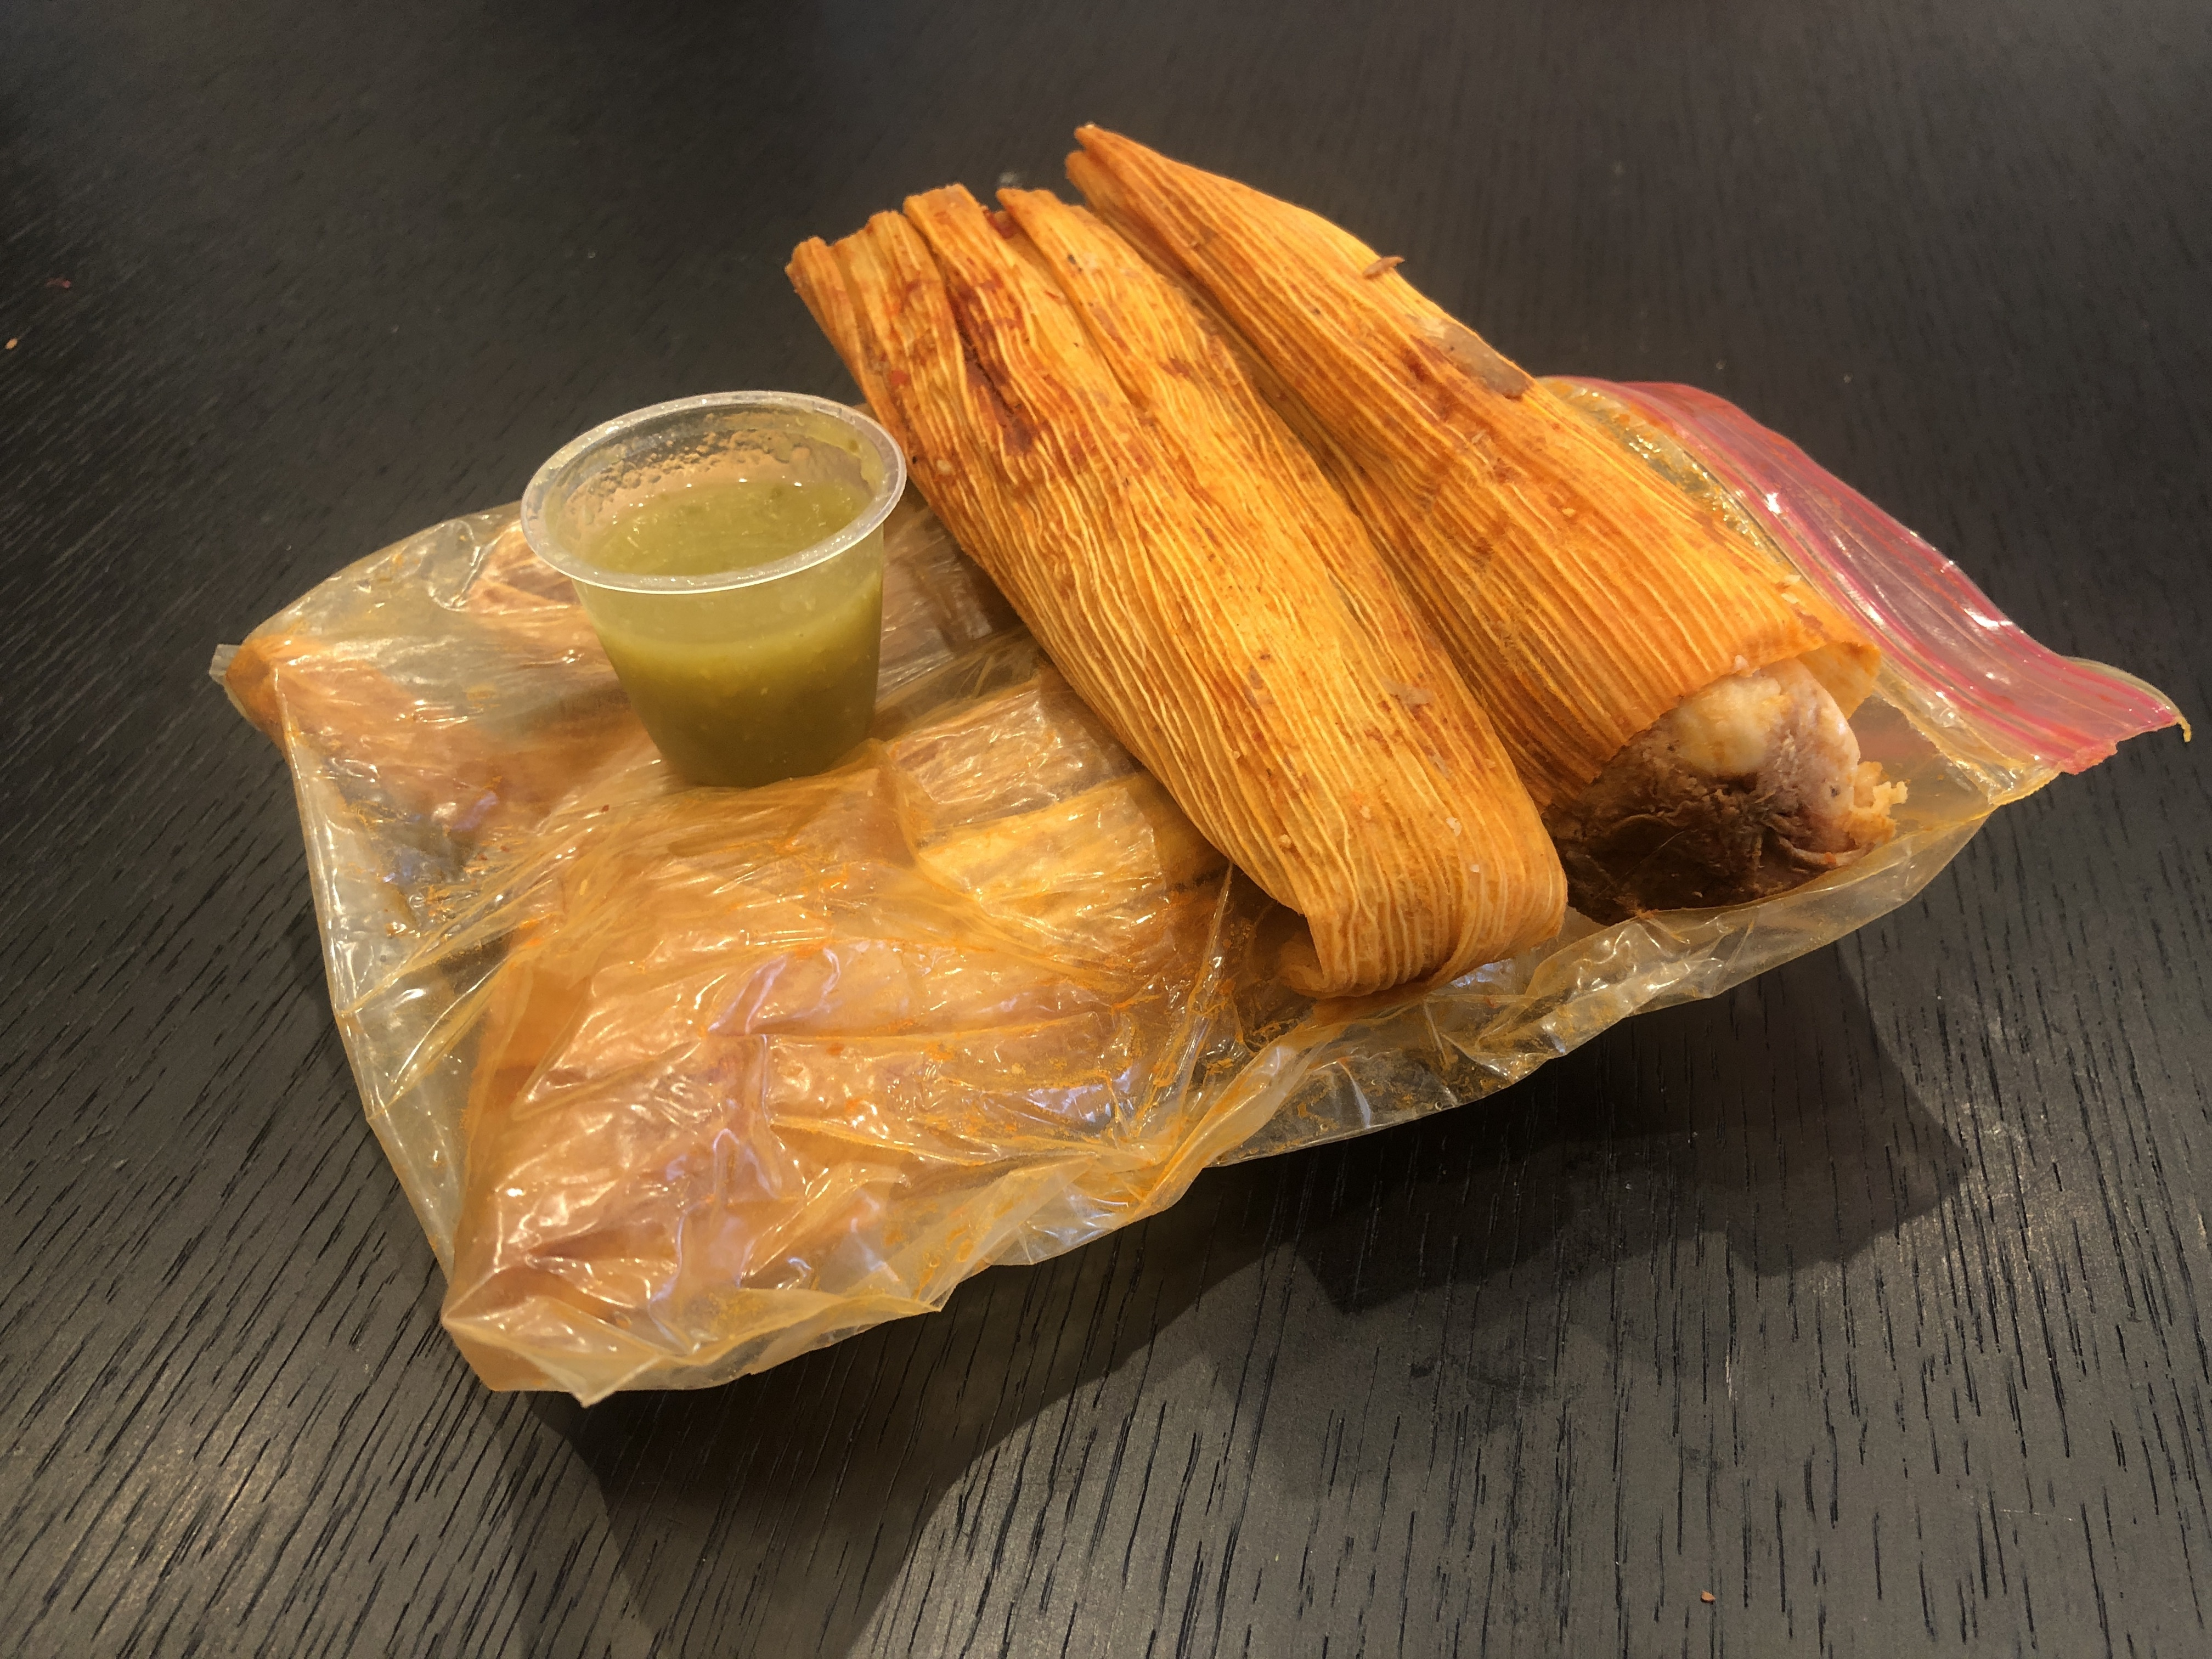 Six tamales in a plastic bag.